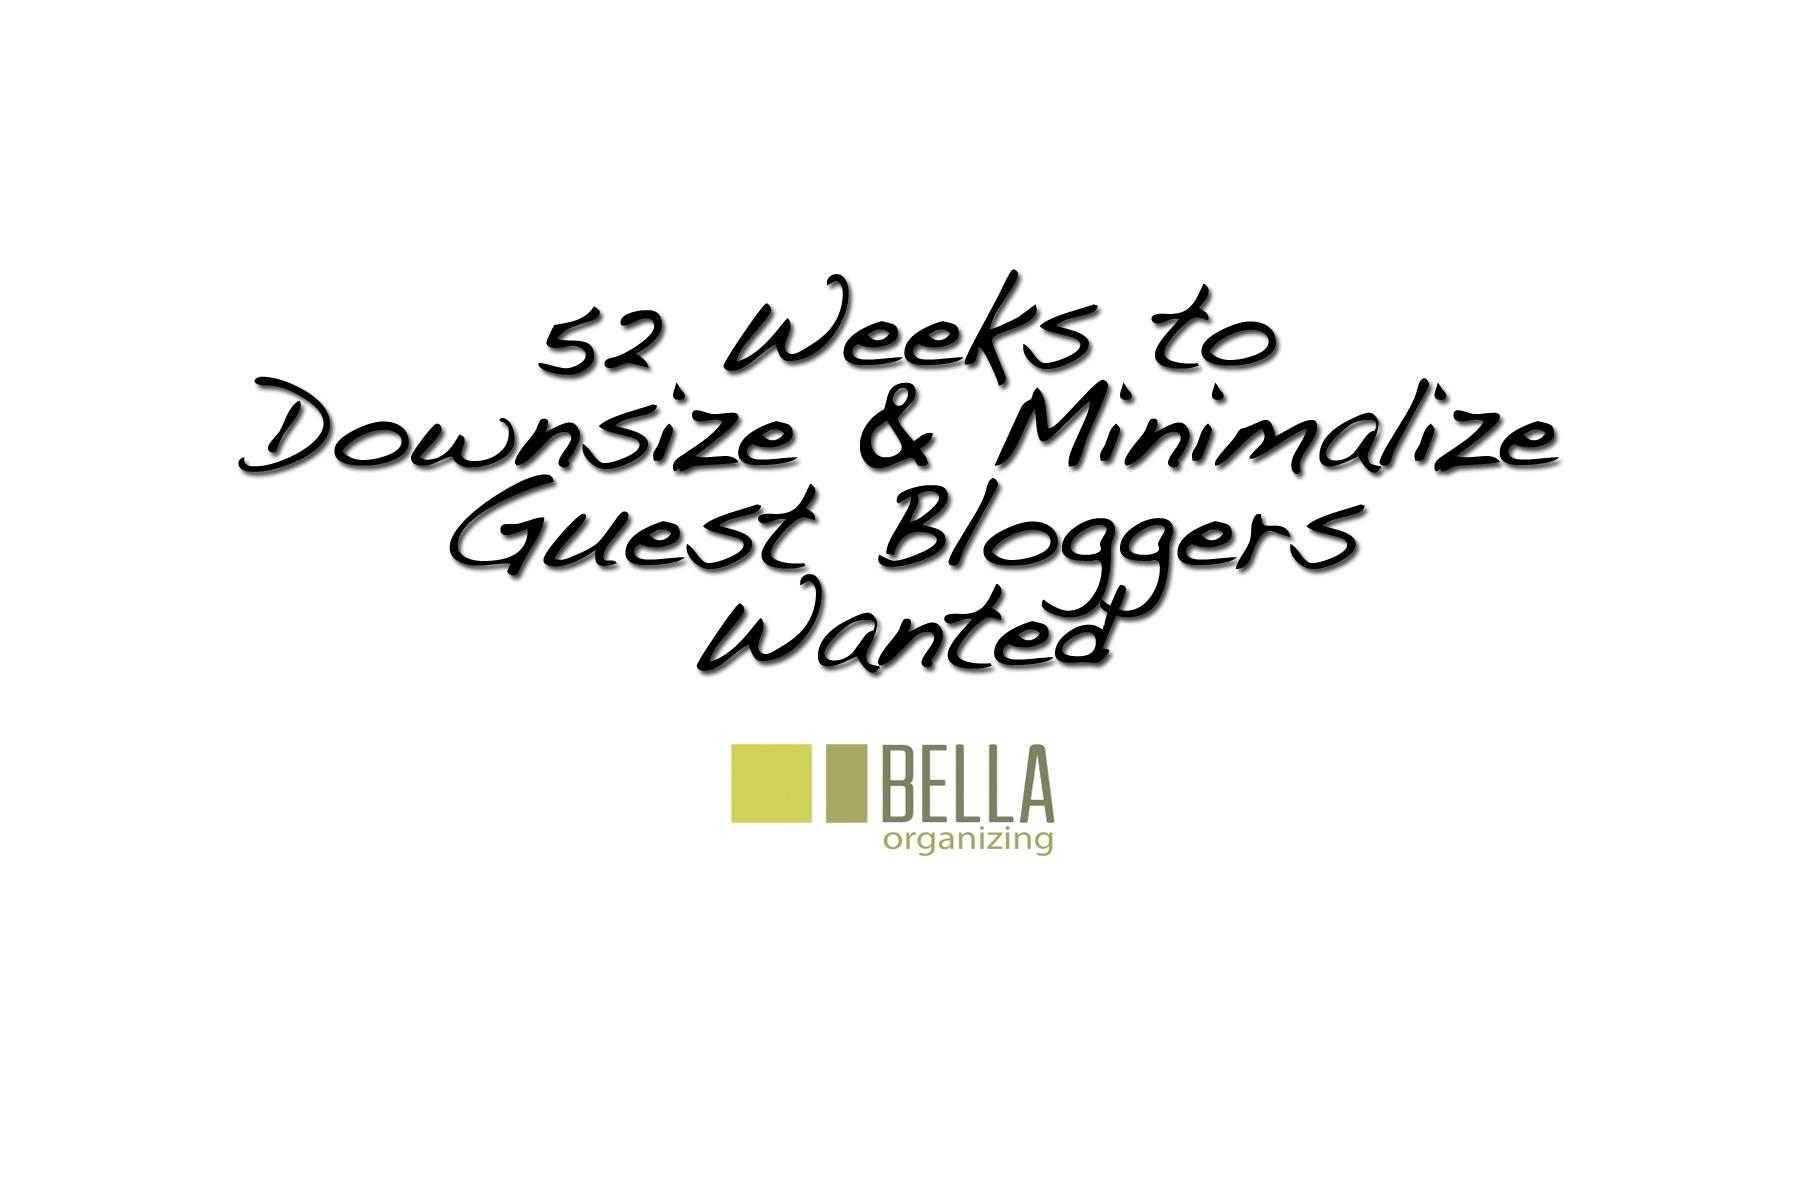 Guest Bloggers Wanter | Bella Organizing | San Francisco Bay Area